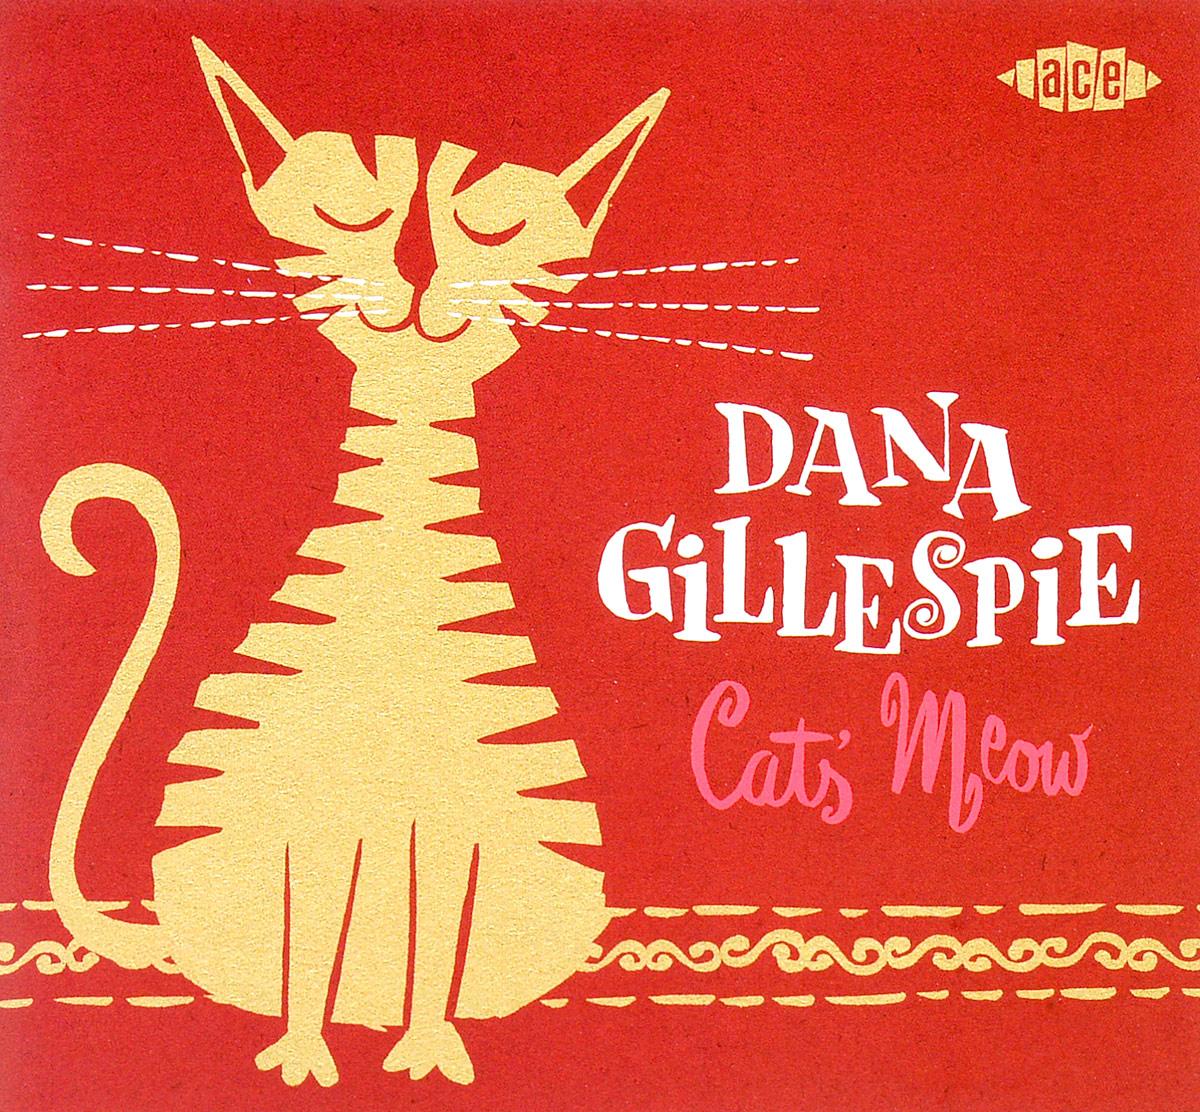 Дана Гиллеспи Dana Gillespie. Cats' Meow дана гиллеспи the london blues band dana gillespie the london blues band live